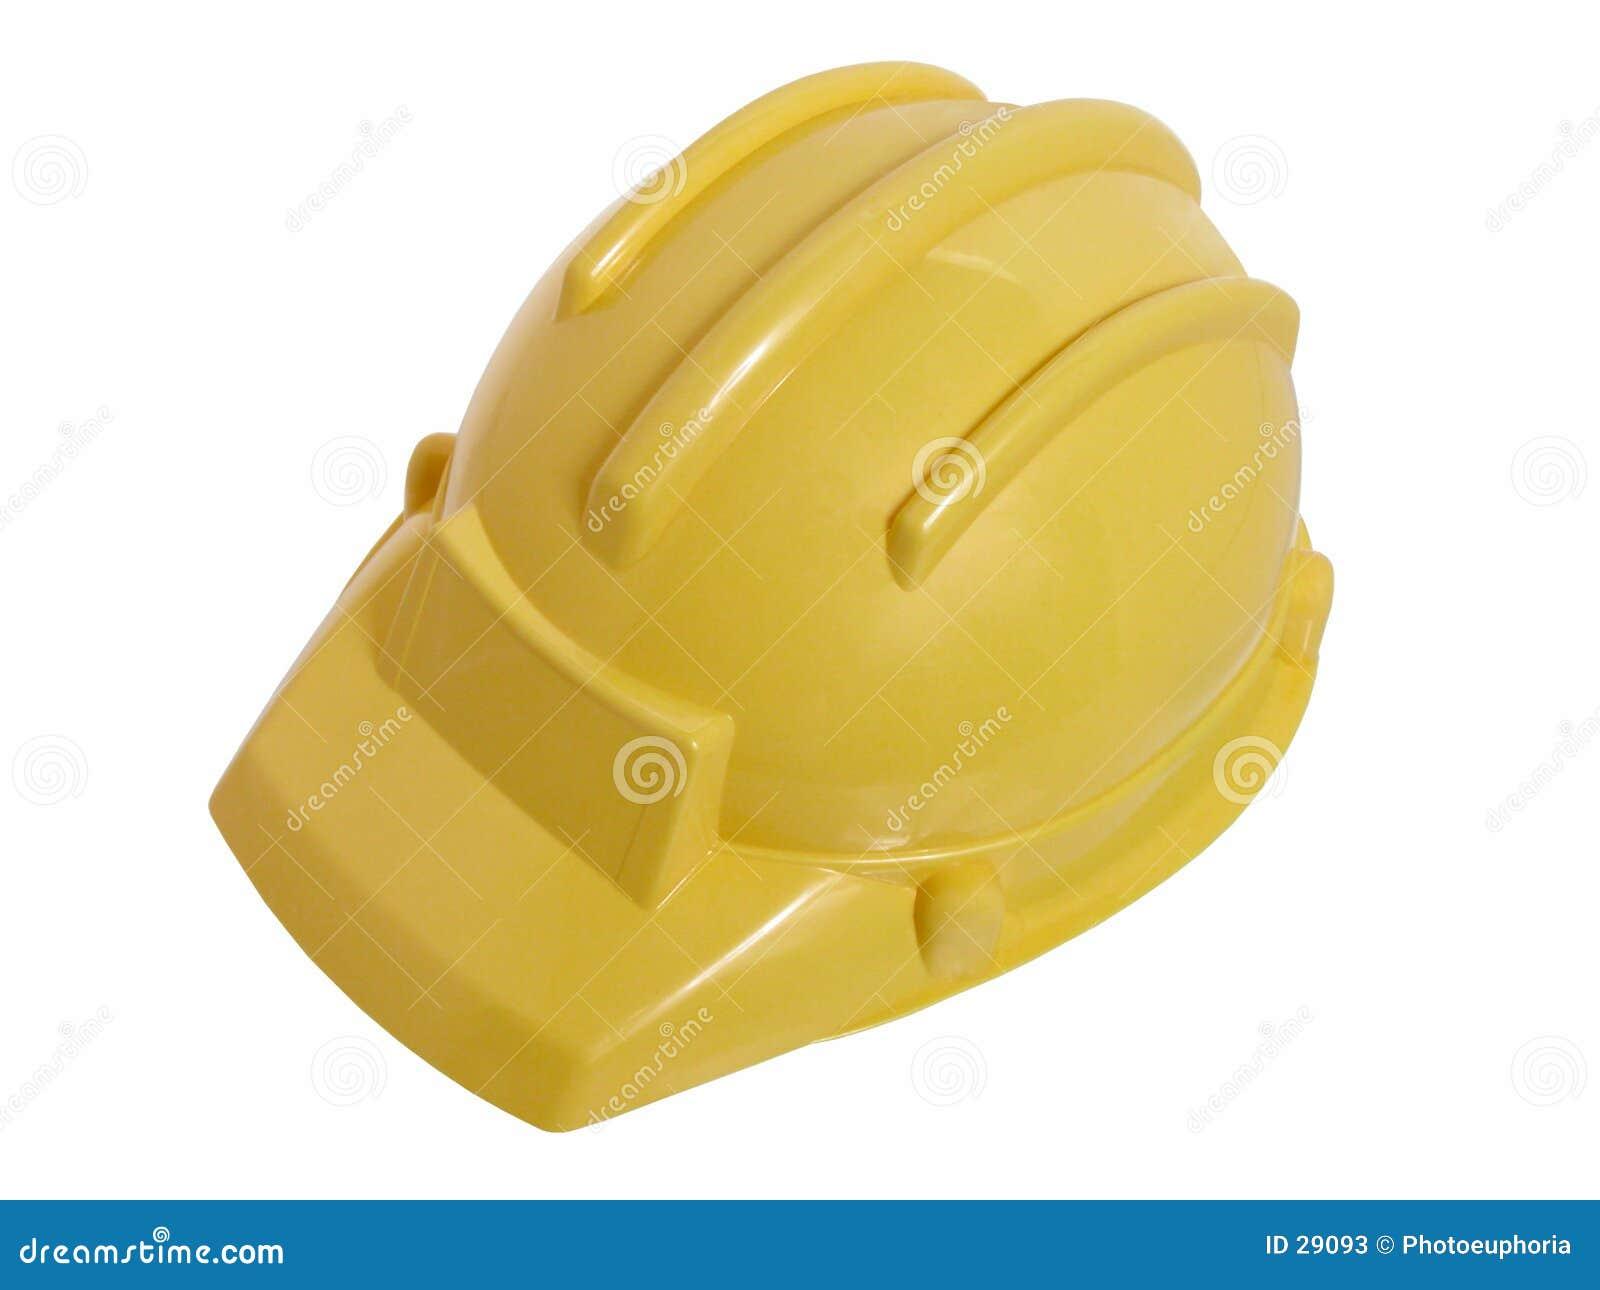 Toys: Yellow Construction Helmet